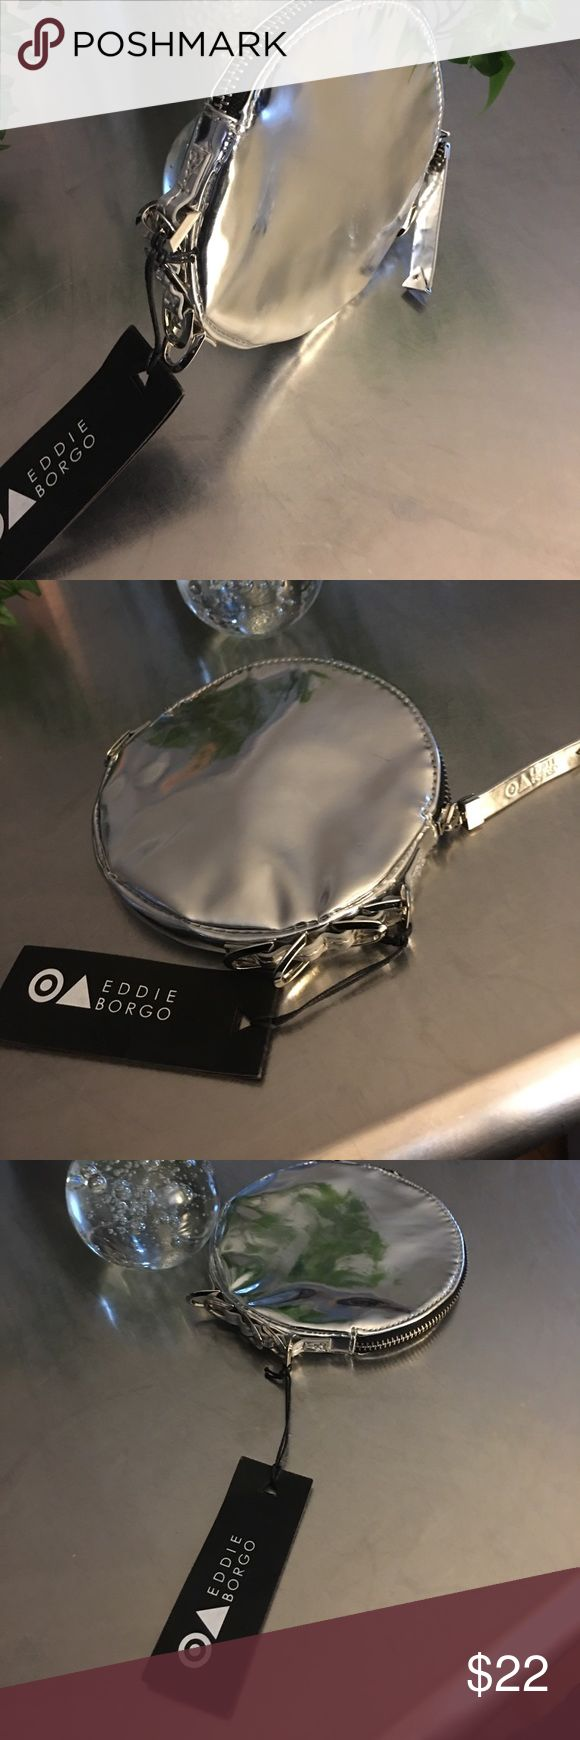 Eddie Borgo Geometric Metallic Clutch/ NWT Edgy Circular Clutch Bag/ NWT Eddie Borgo Bags Clutches & Wristlets